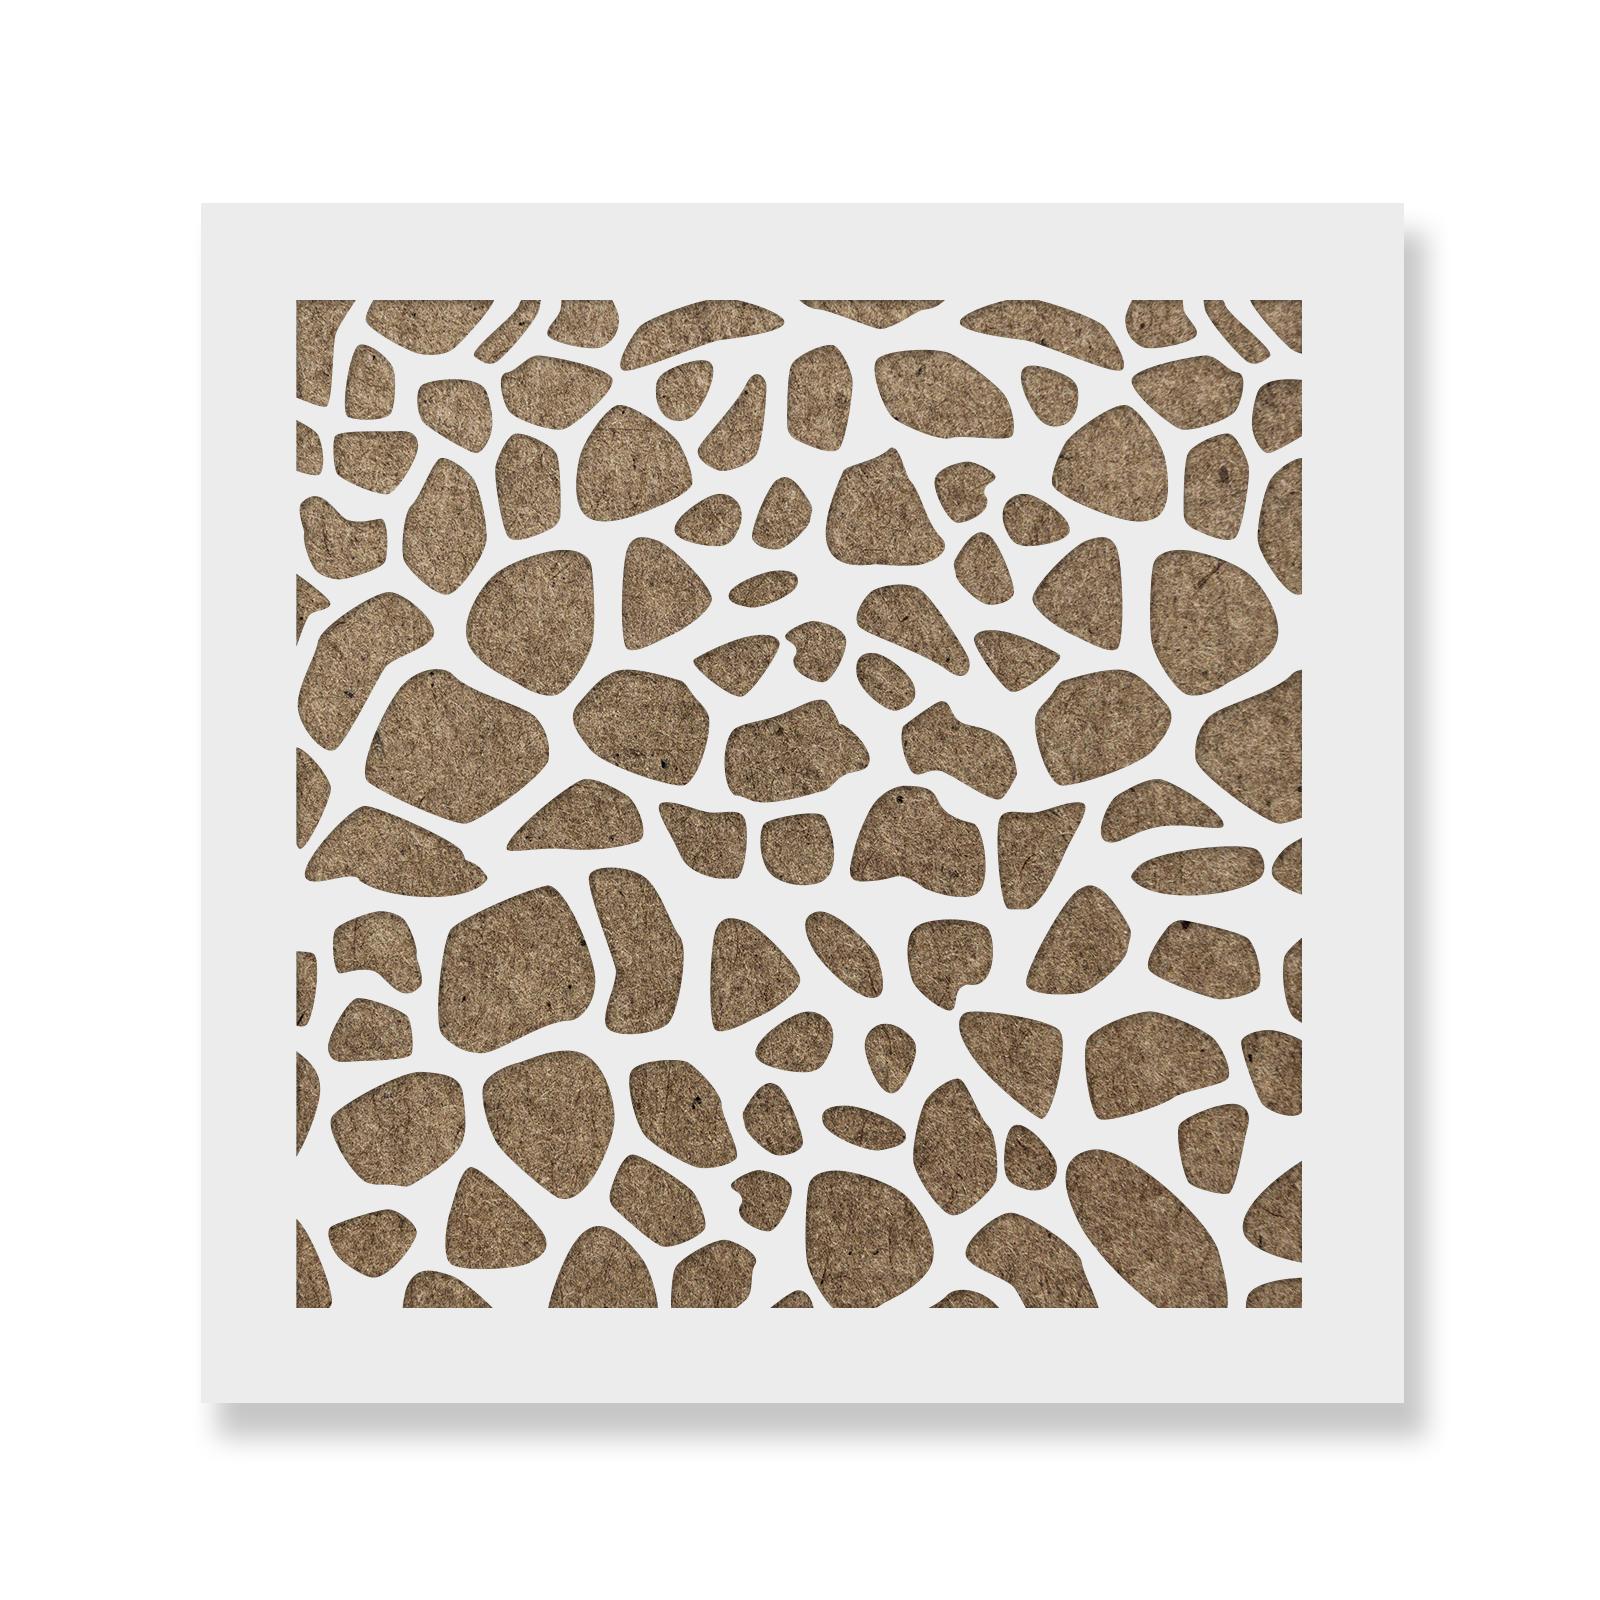 Durable /& Reusable Mylar Stencils Giraffe Cookie Stencil